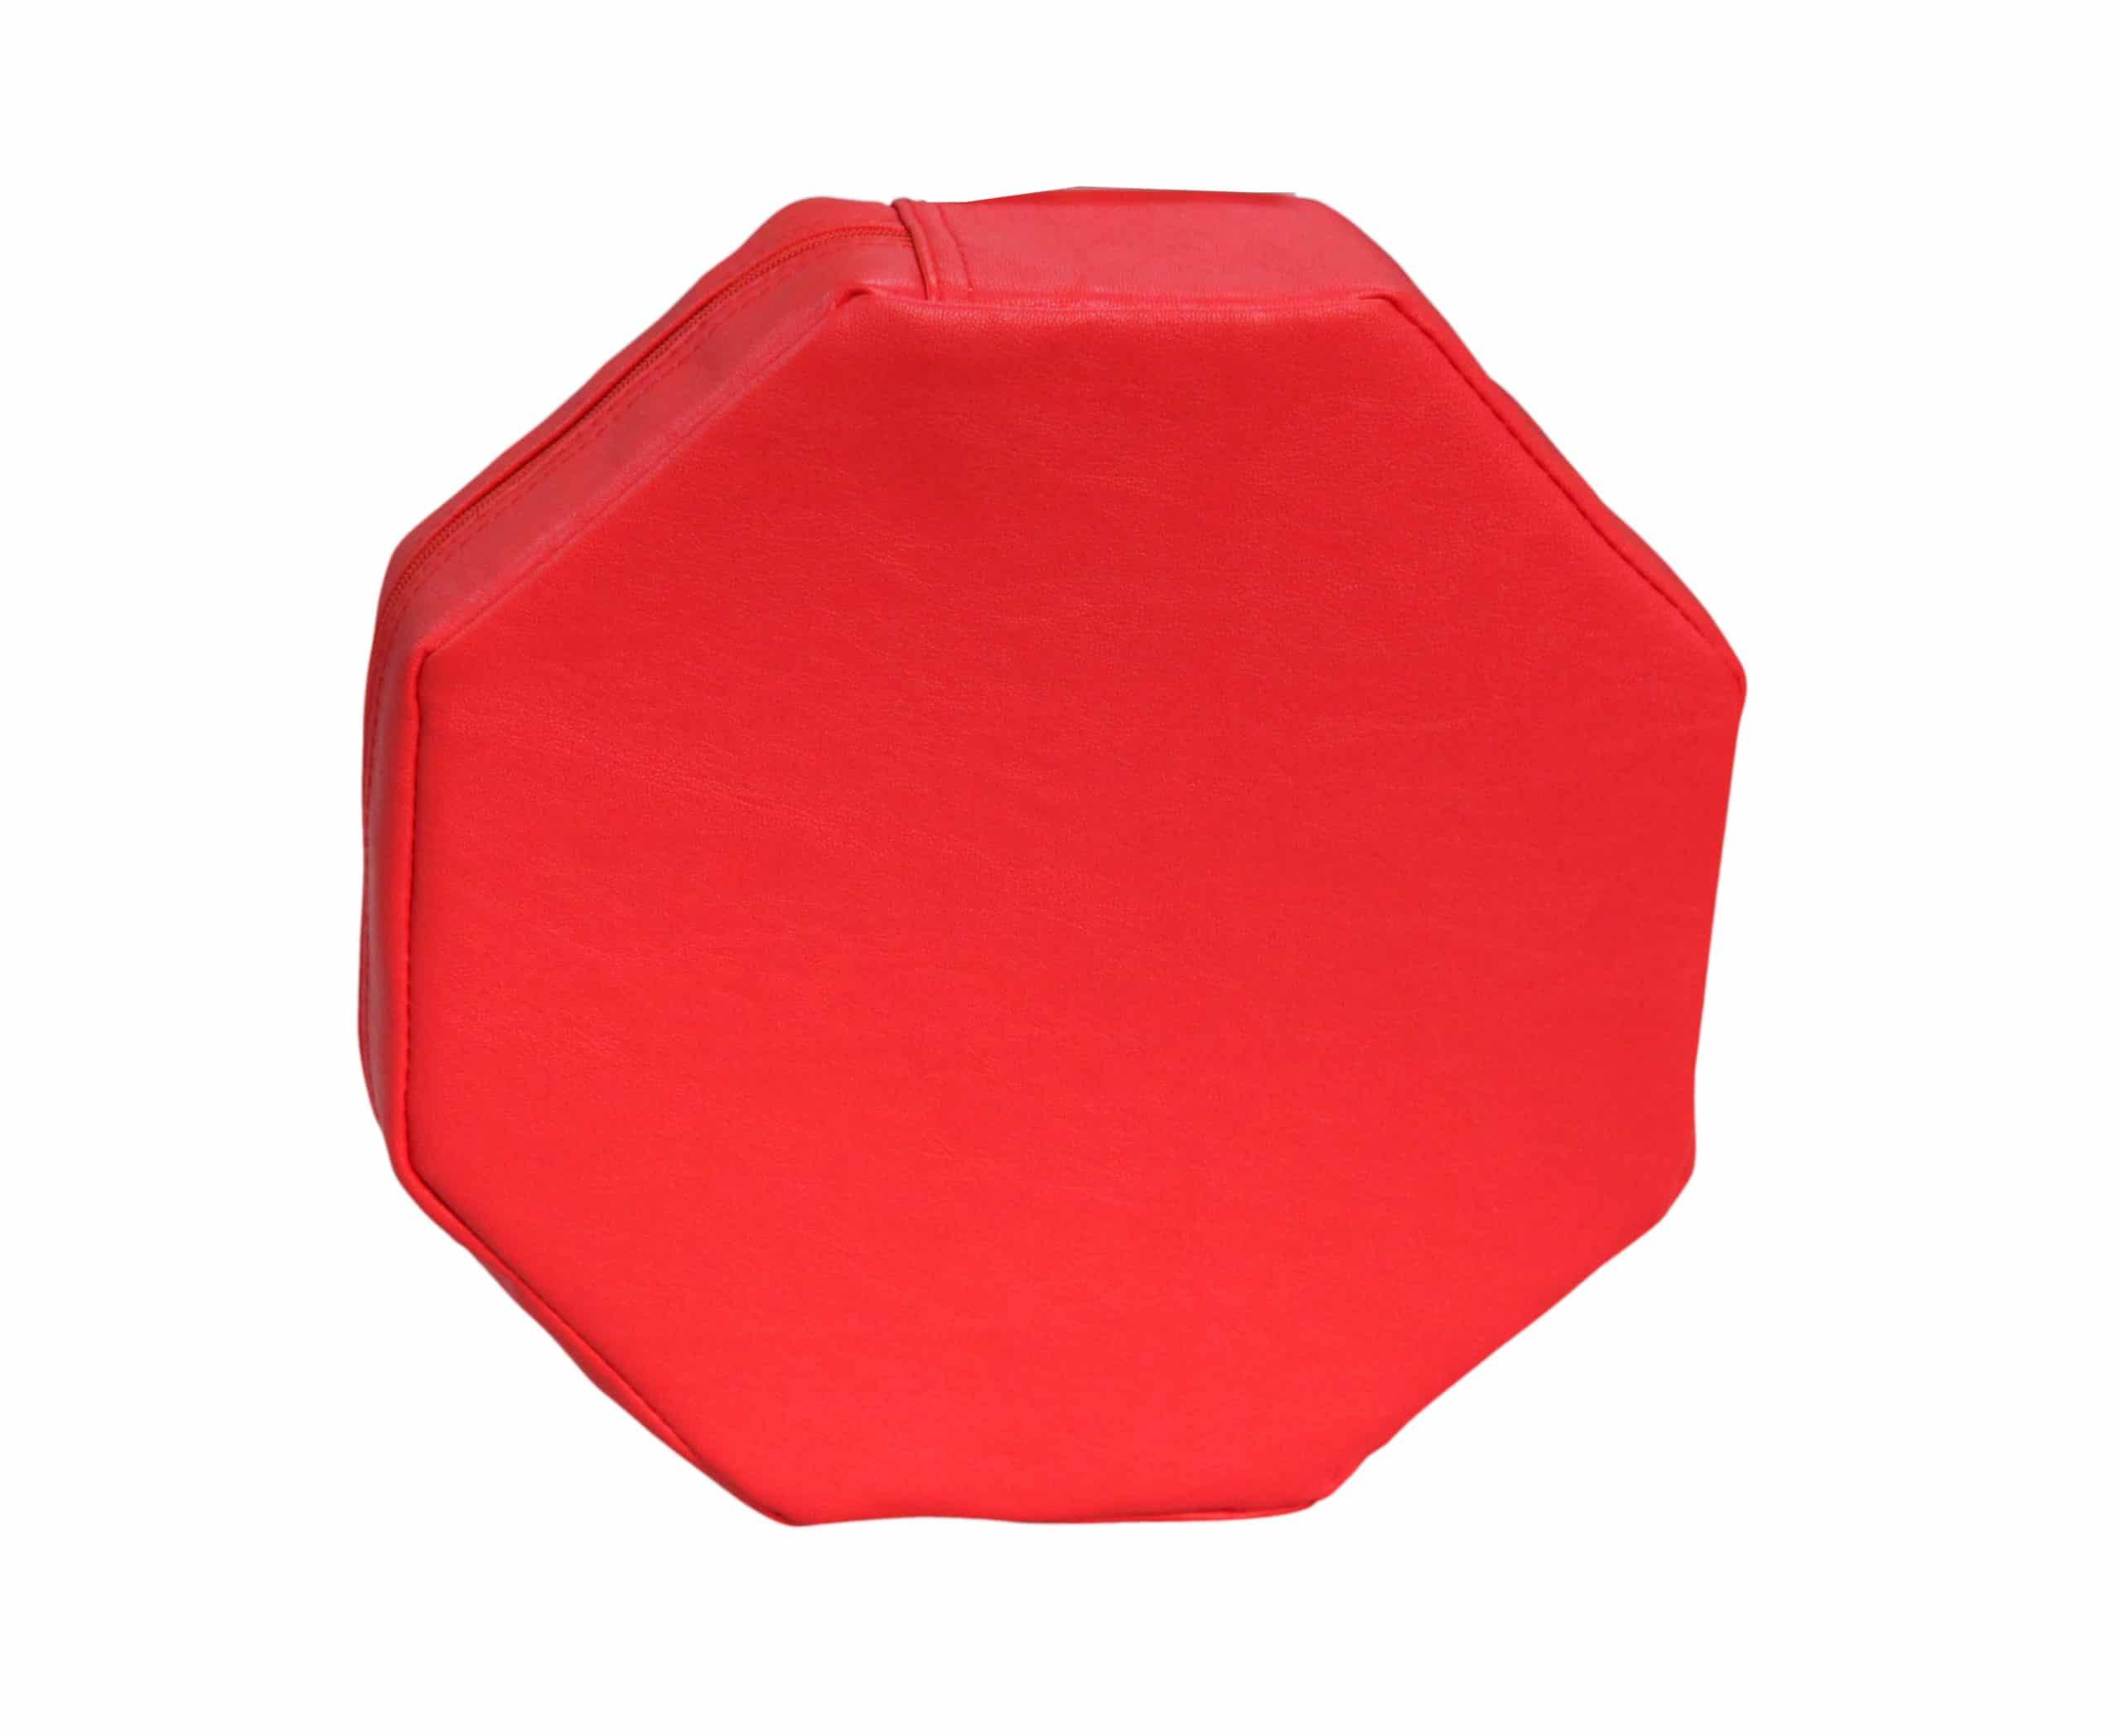 Red Octagon Vibrating Pillow